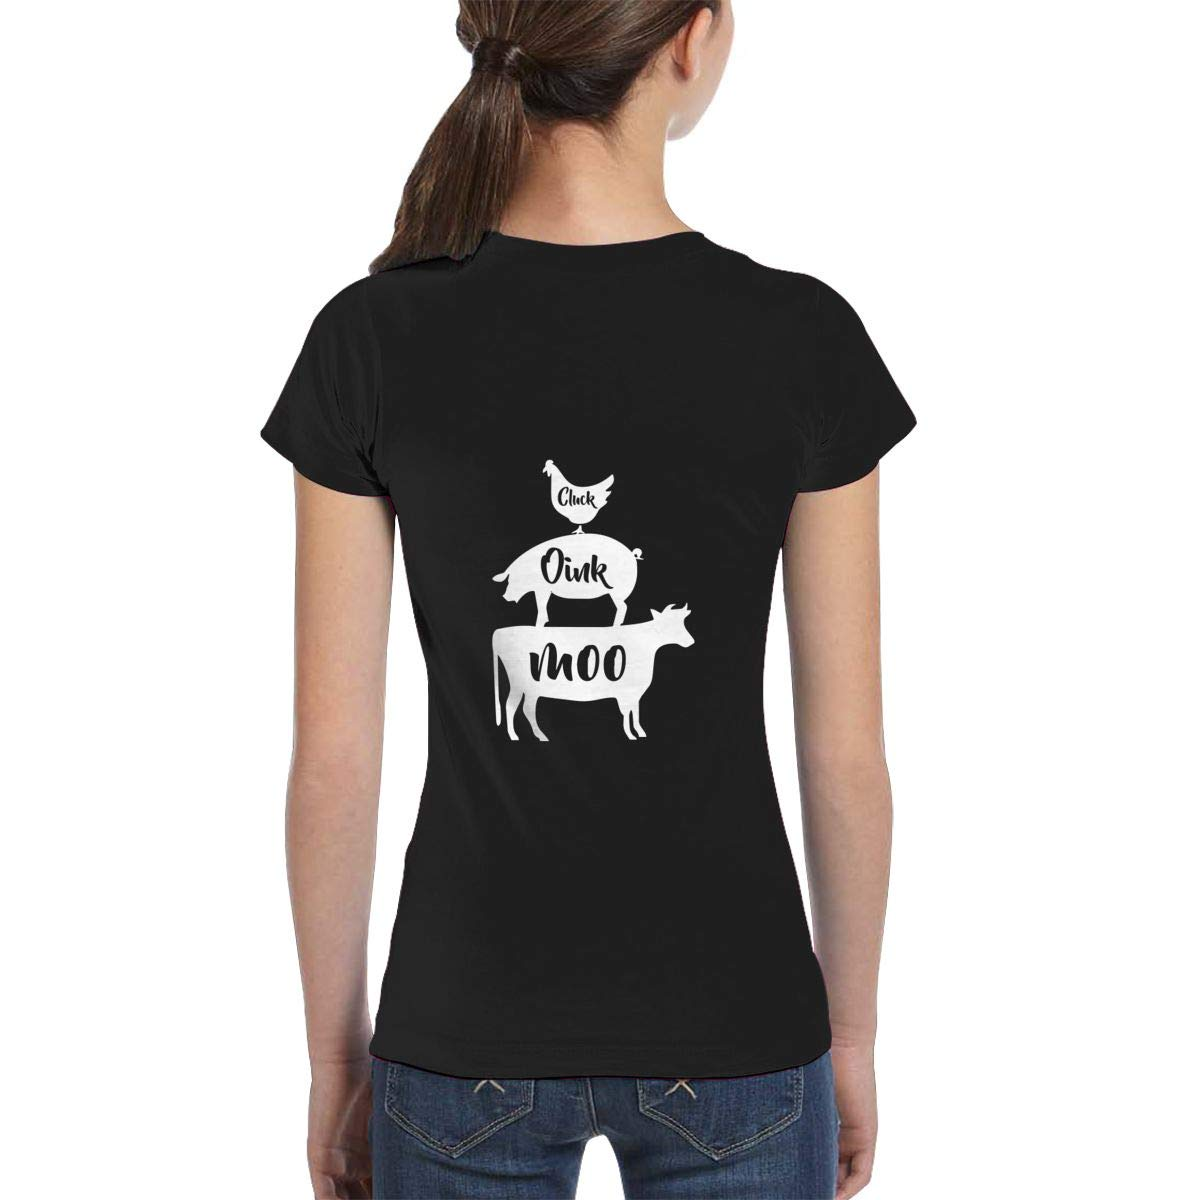 XS-XL Fashion Tunic Shirt Dress Girls Short Sleeve Farm Anilmals Silhouette Chicken Pig Cow-1 Shirts